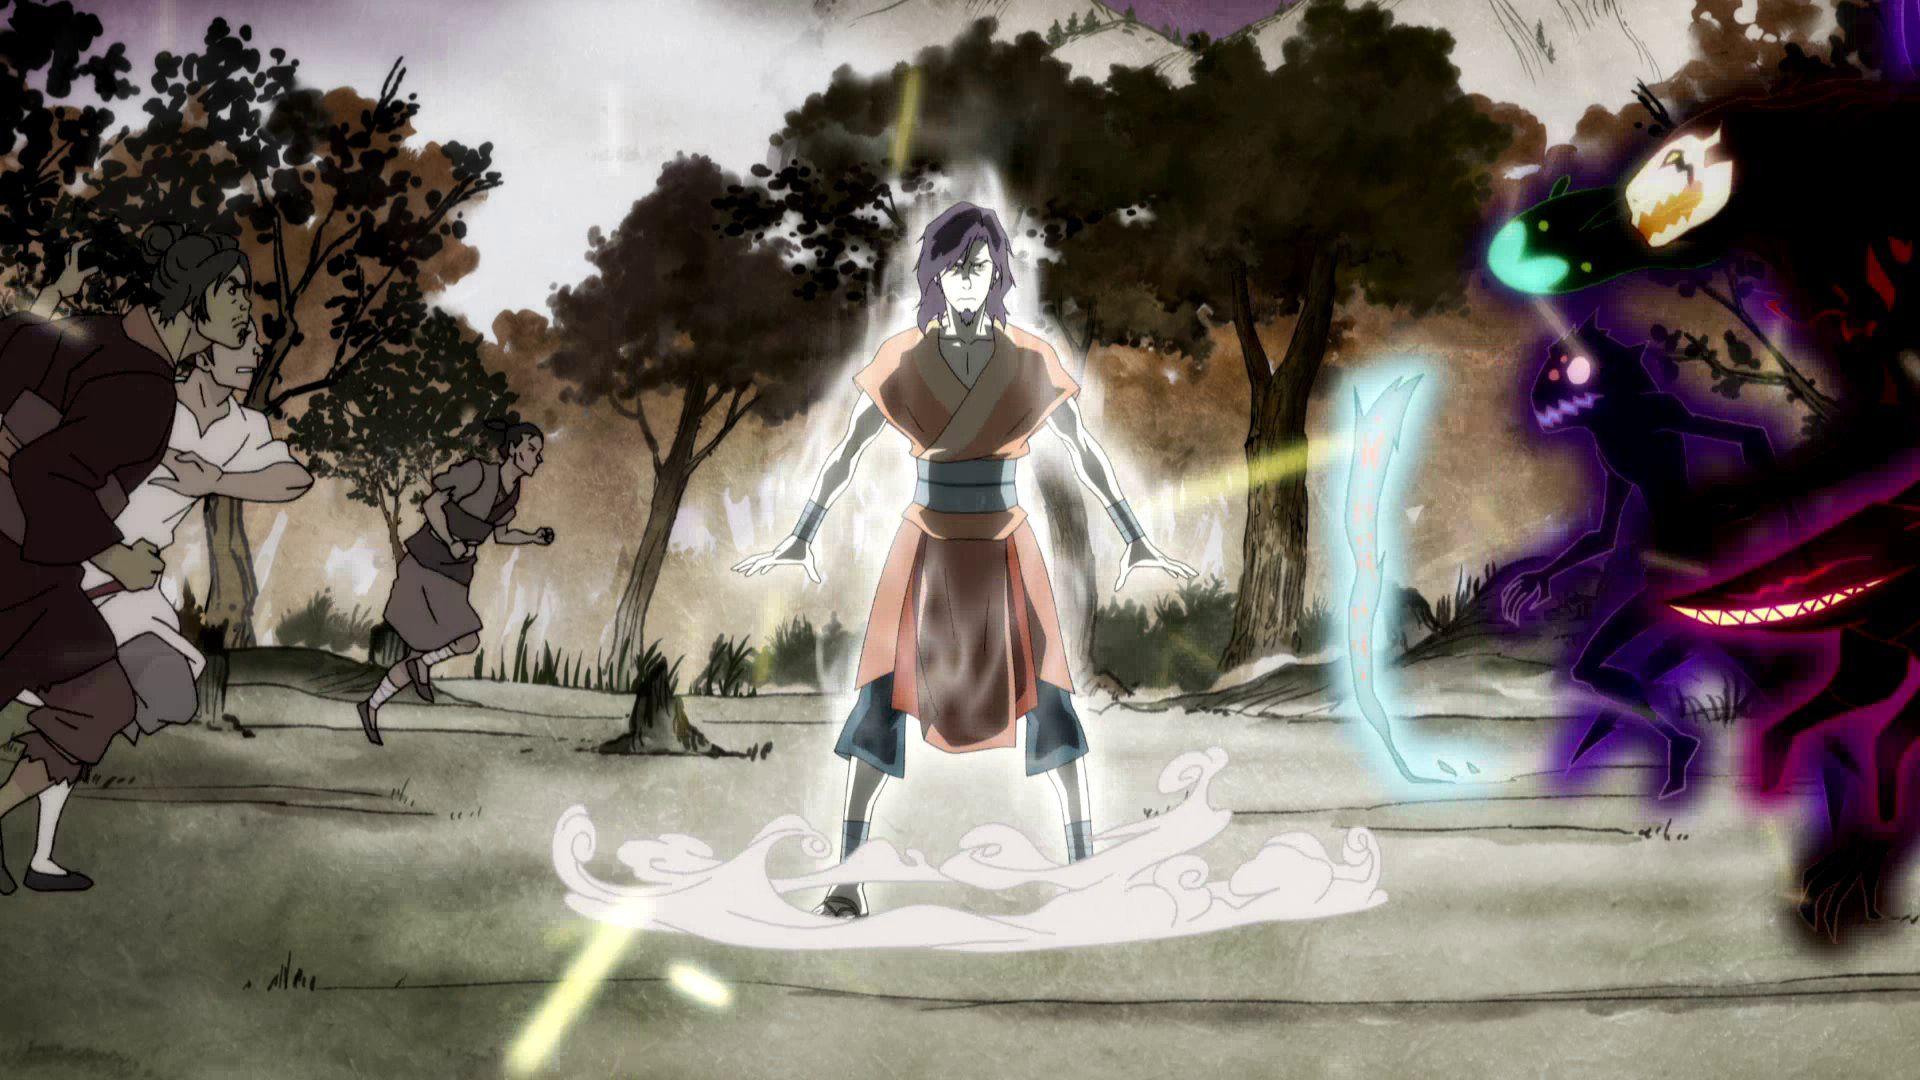 Anime Avatar The Legend Of Korra Wallpaper Just Avatar Avatar 1920x1080